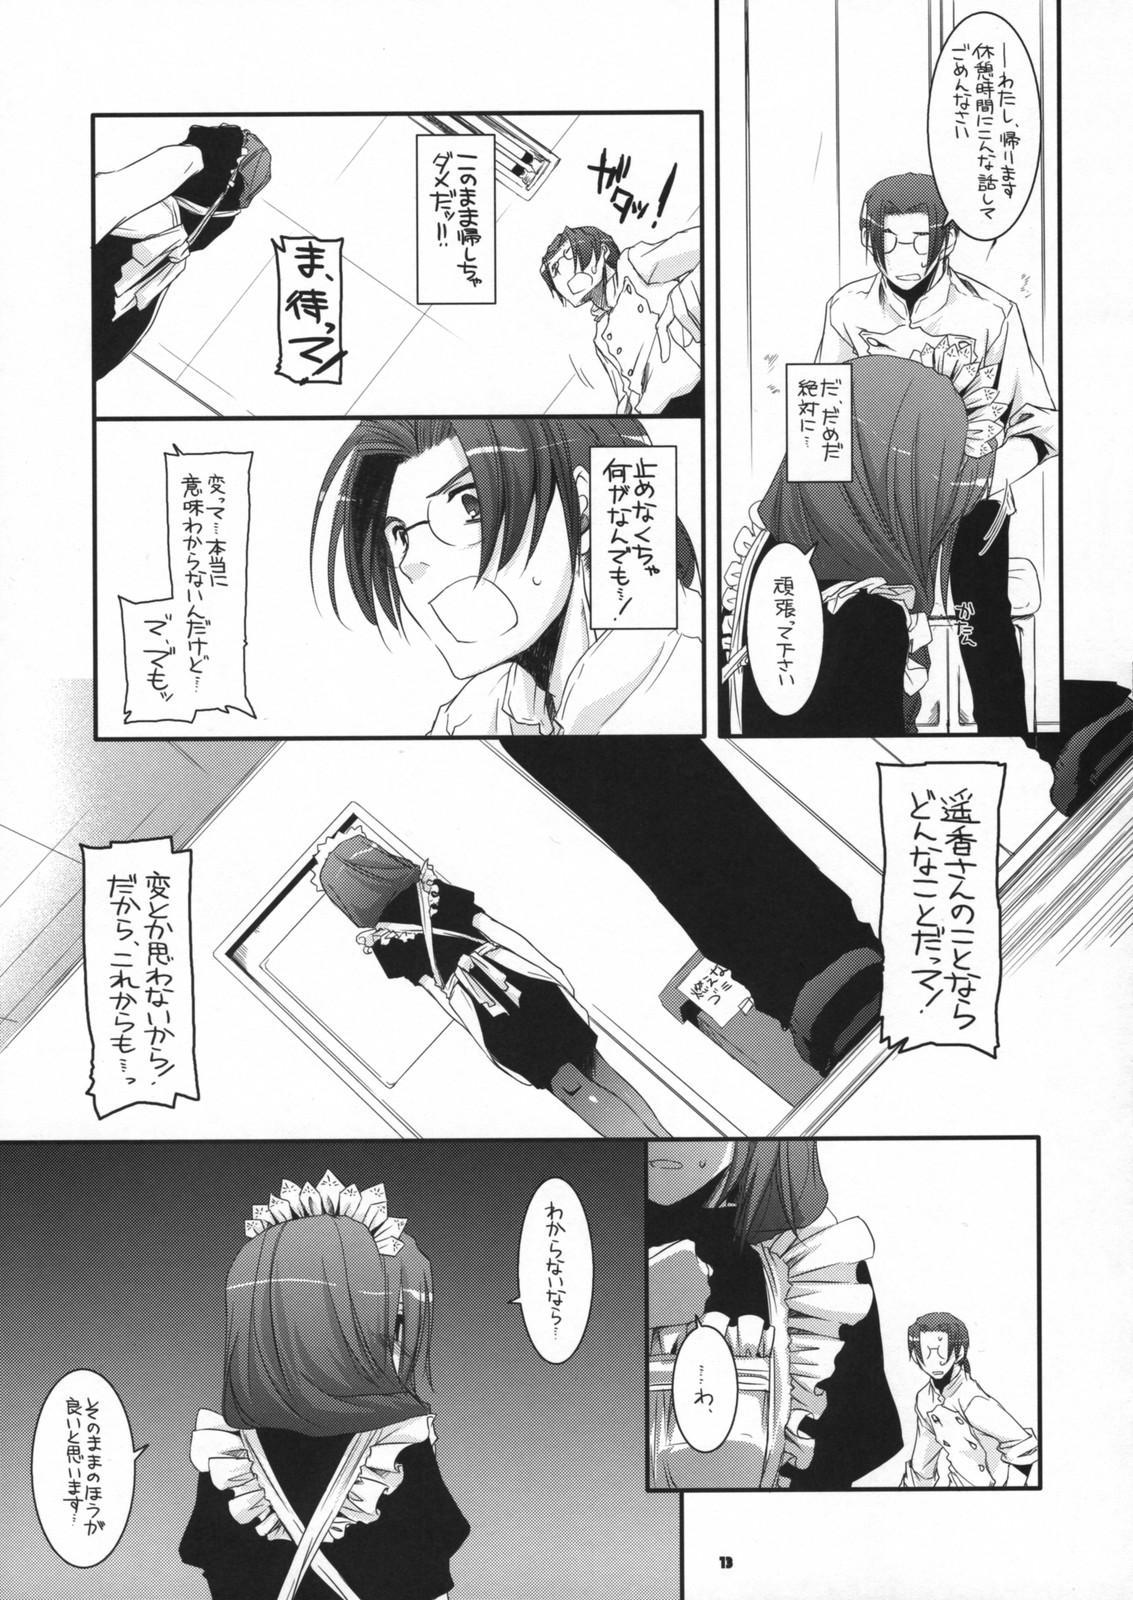 Seifuku Rakuen 21 - Costume Paradise 21 11